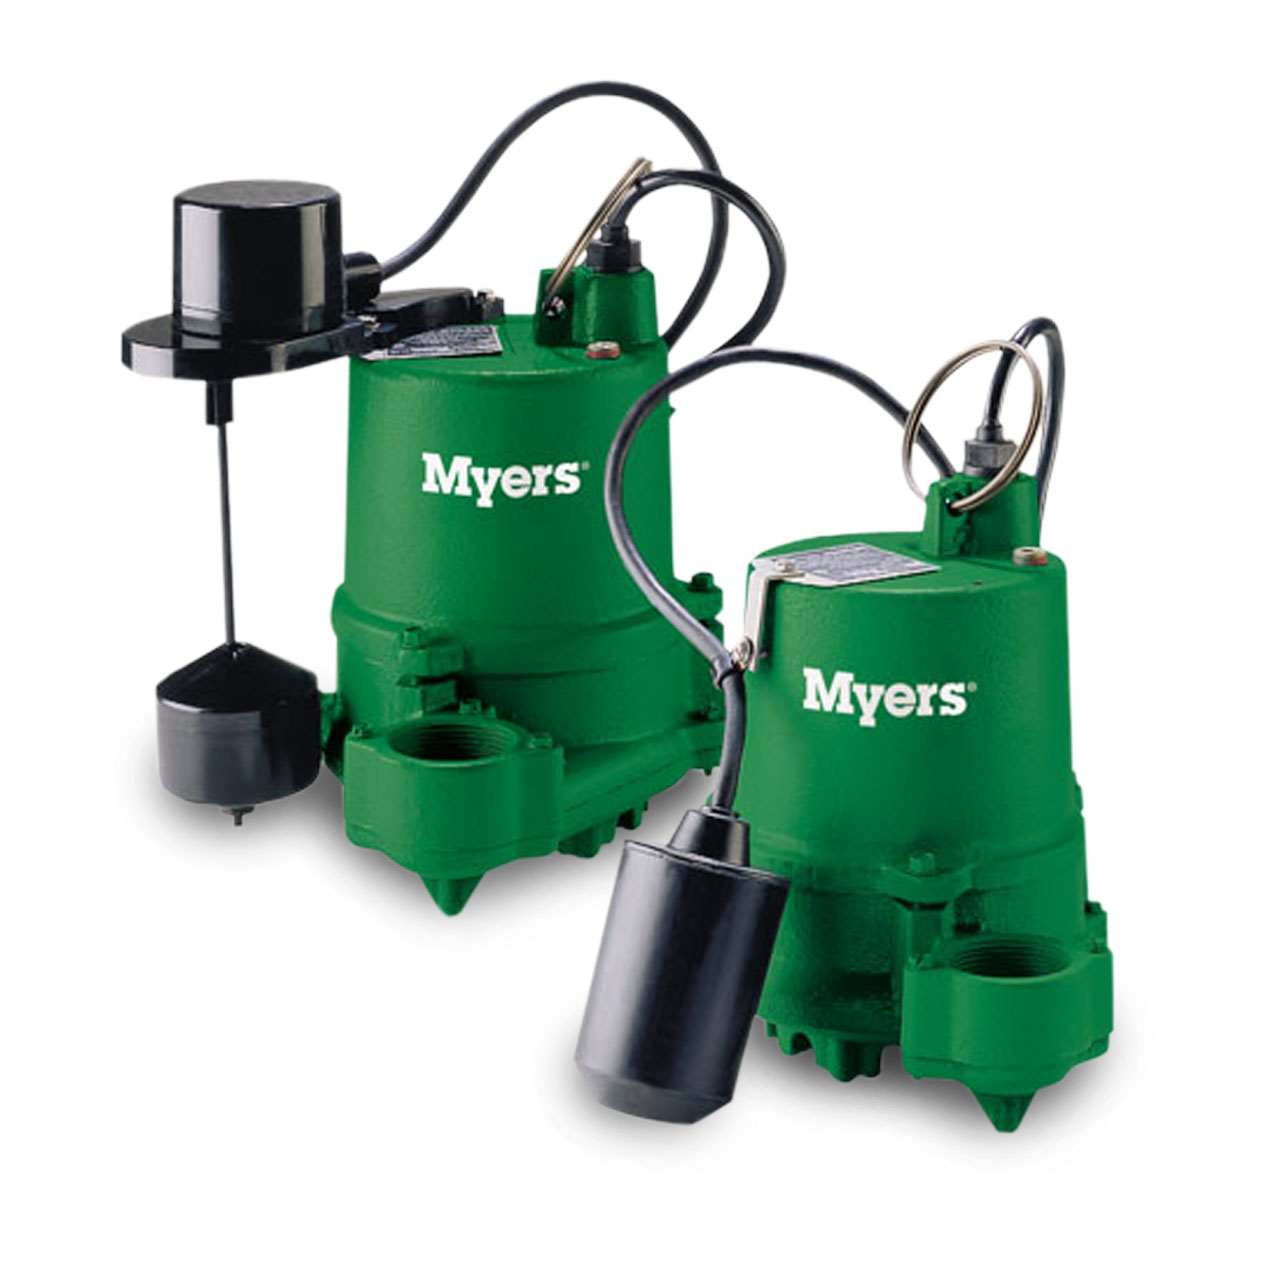 Myers Ssm33ip 1 Sump Pump 033 Hp 115v 10 Cord Automatic Little Giant Power Wiring Diagram Myrssm33ip1